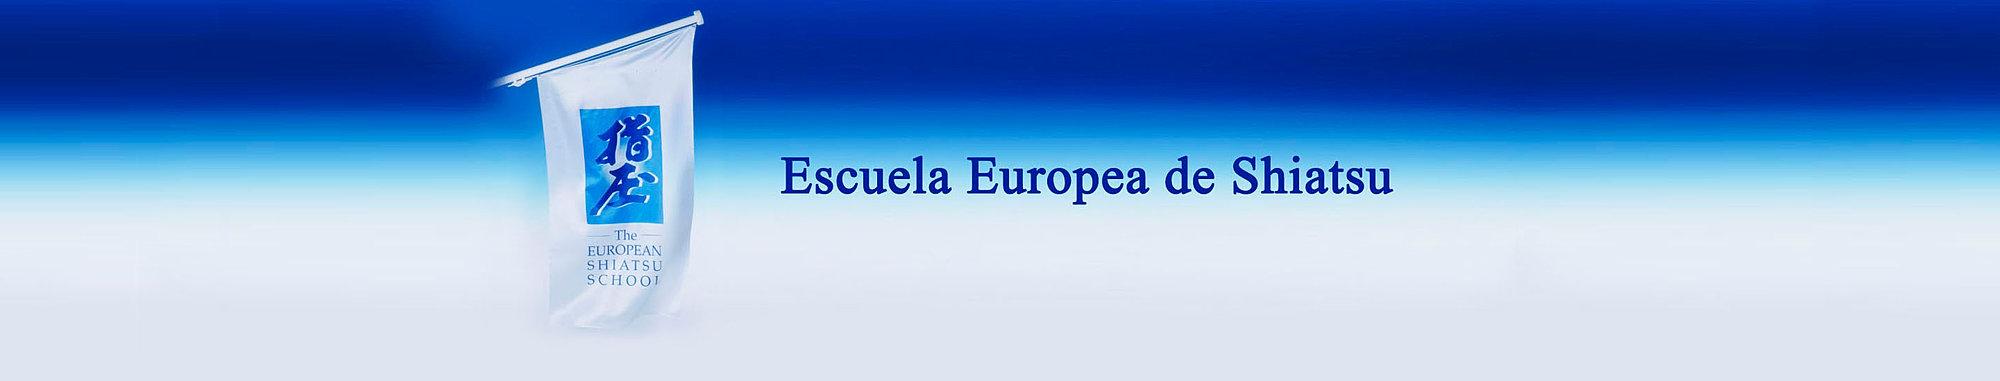 Cursos de Shiatsu en España